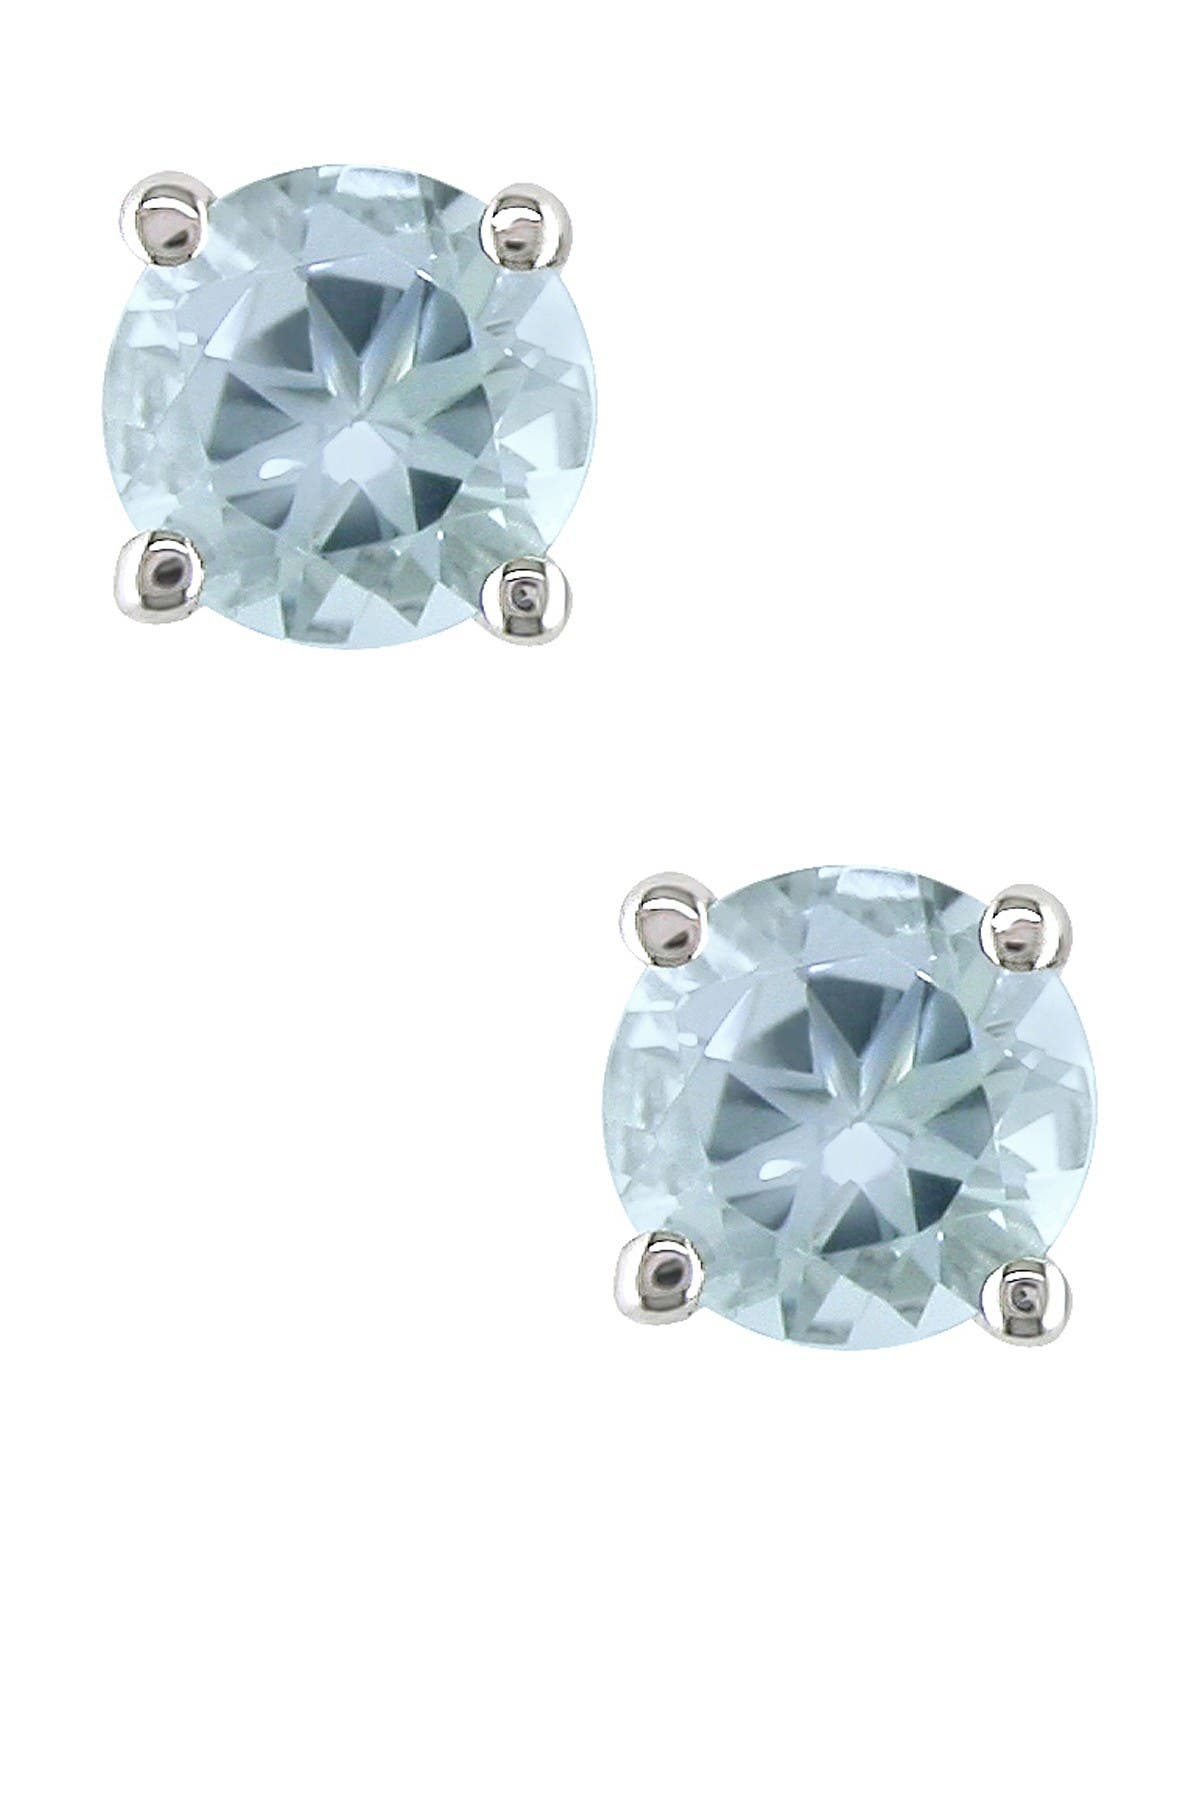 Image of Delmar 14K White Gold Round Aquamarine Stud Earrings